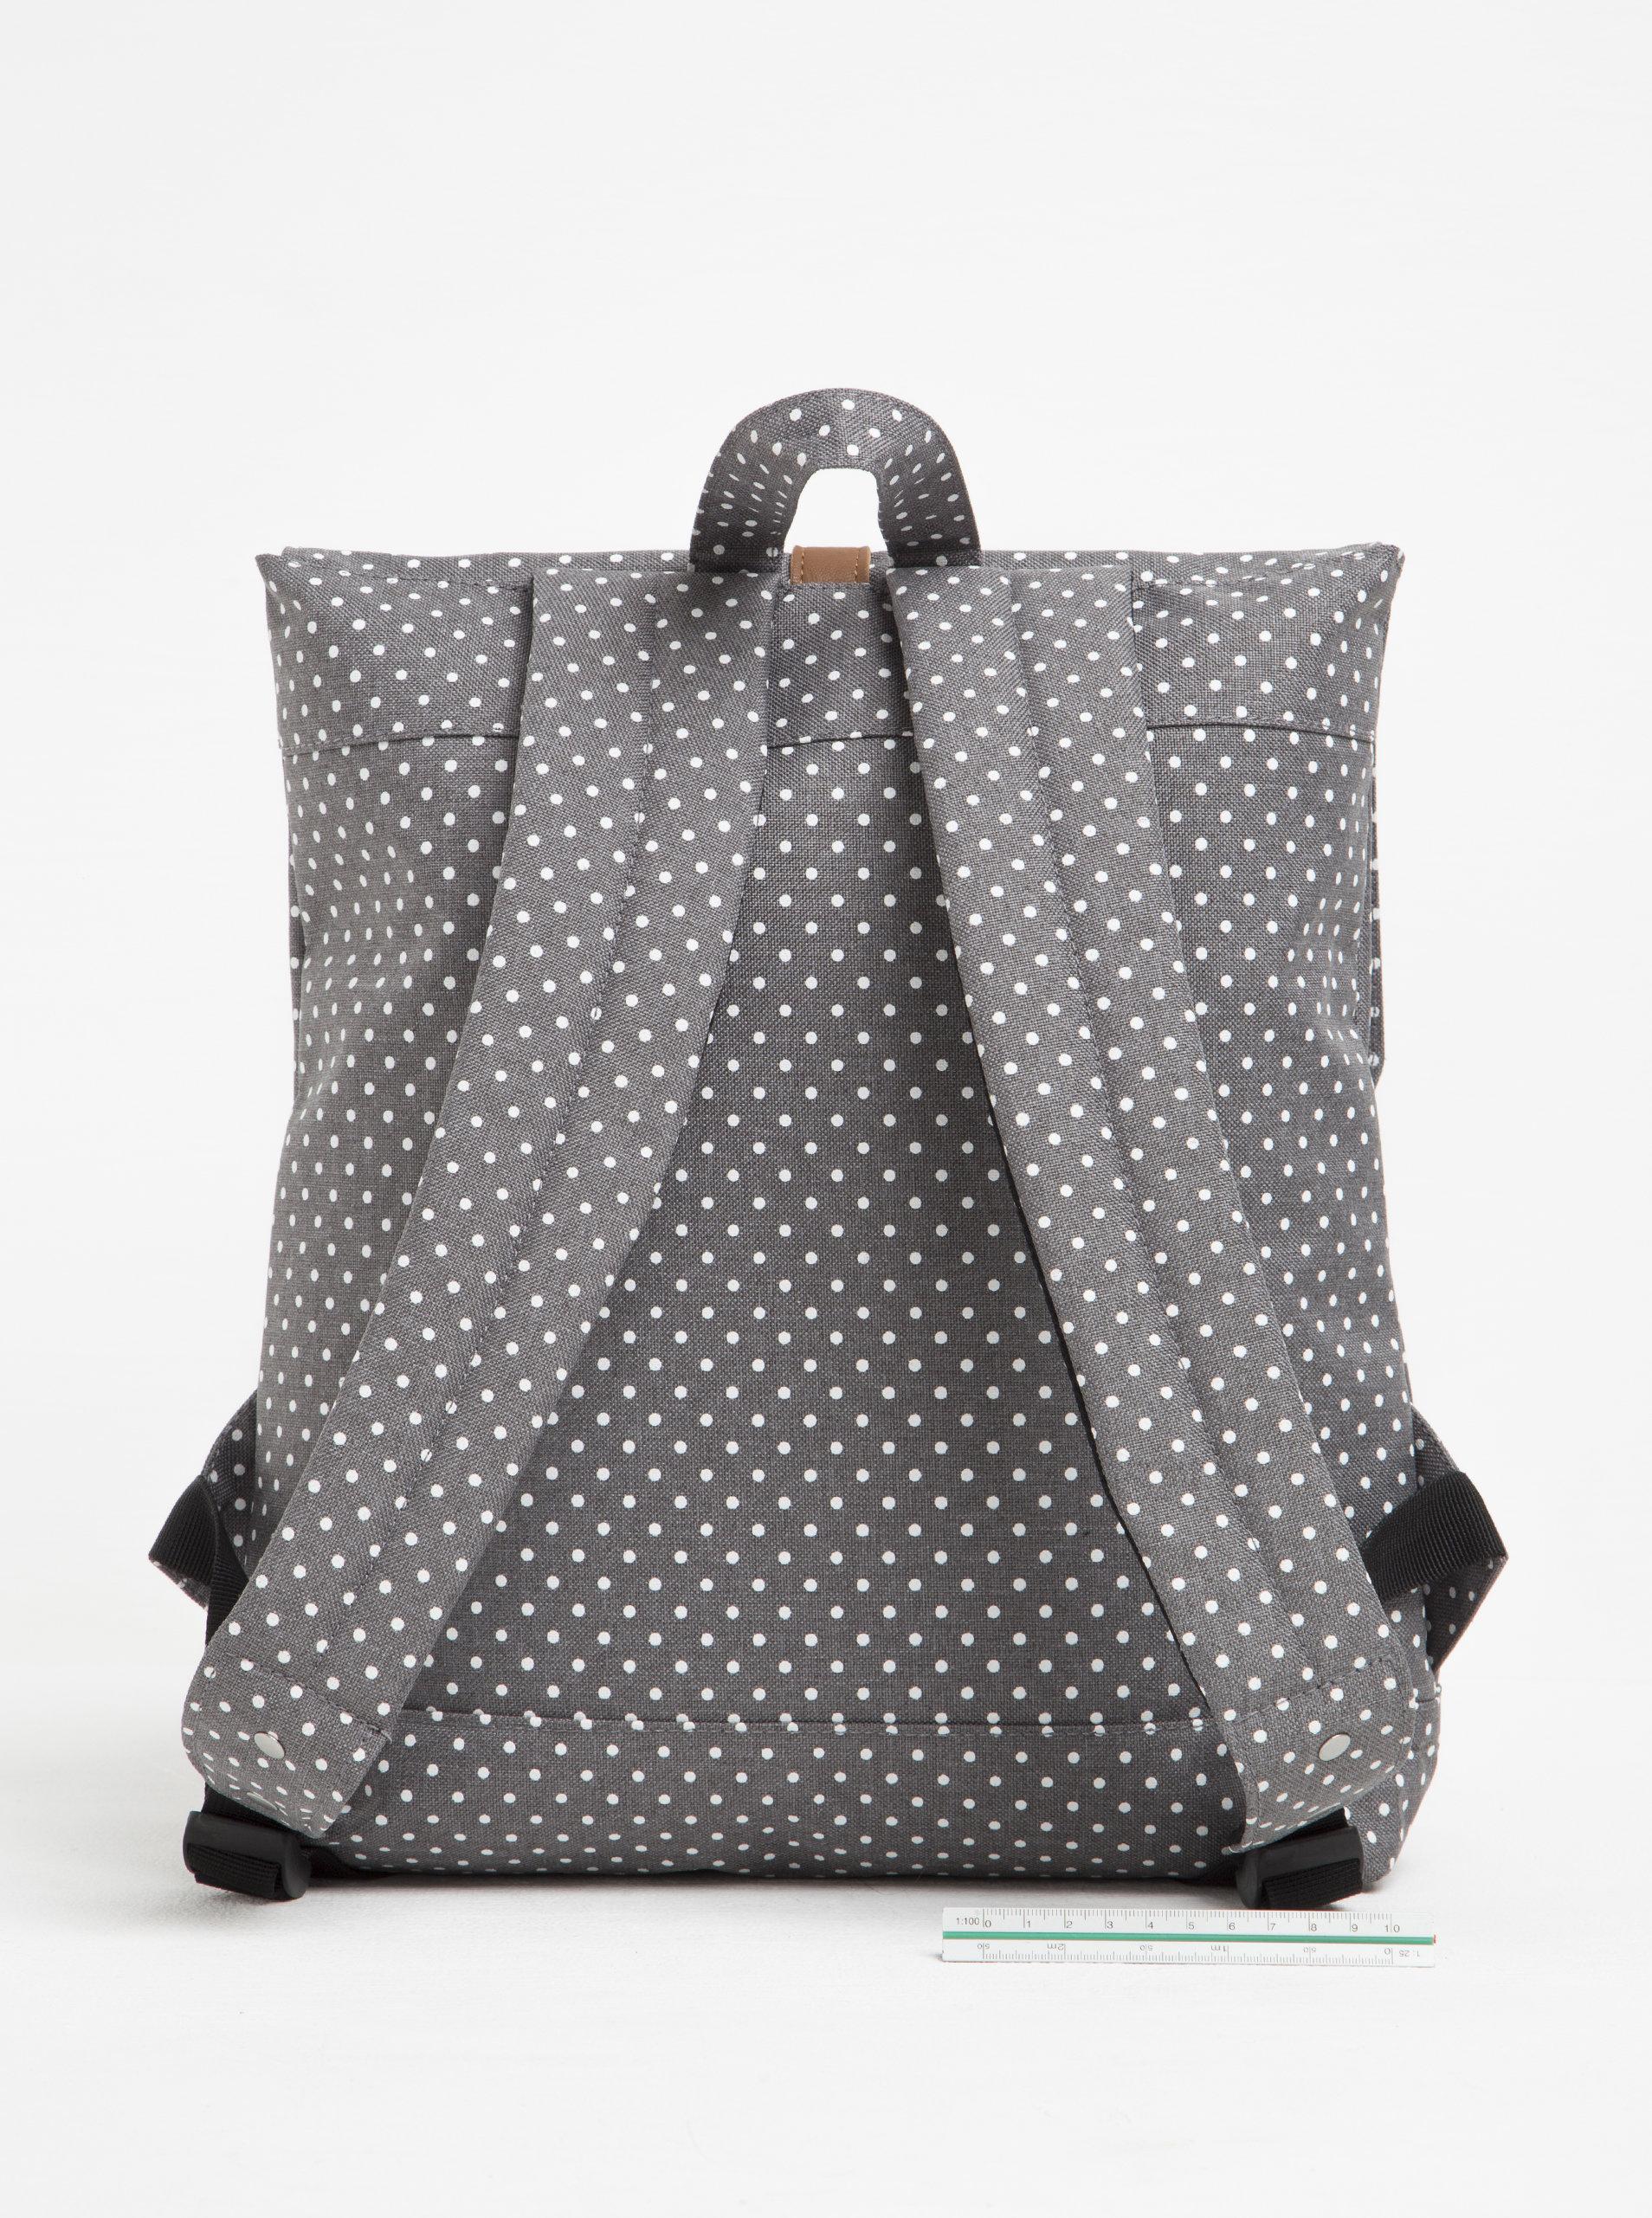 Bílo-šedý batoh Enter Backpack Mini 8 l ... 232c6b7601